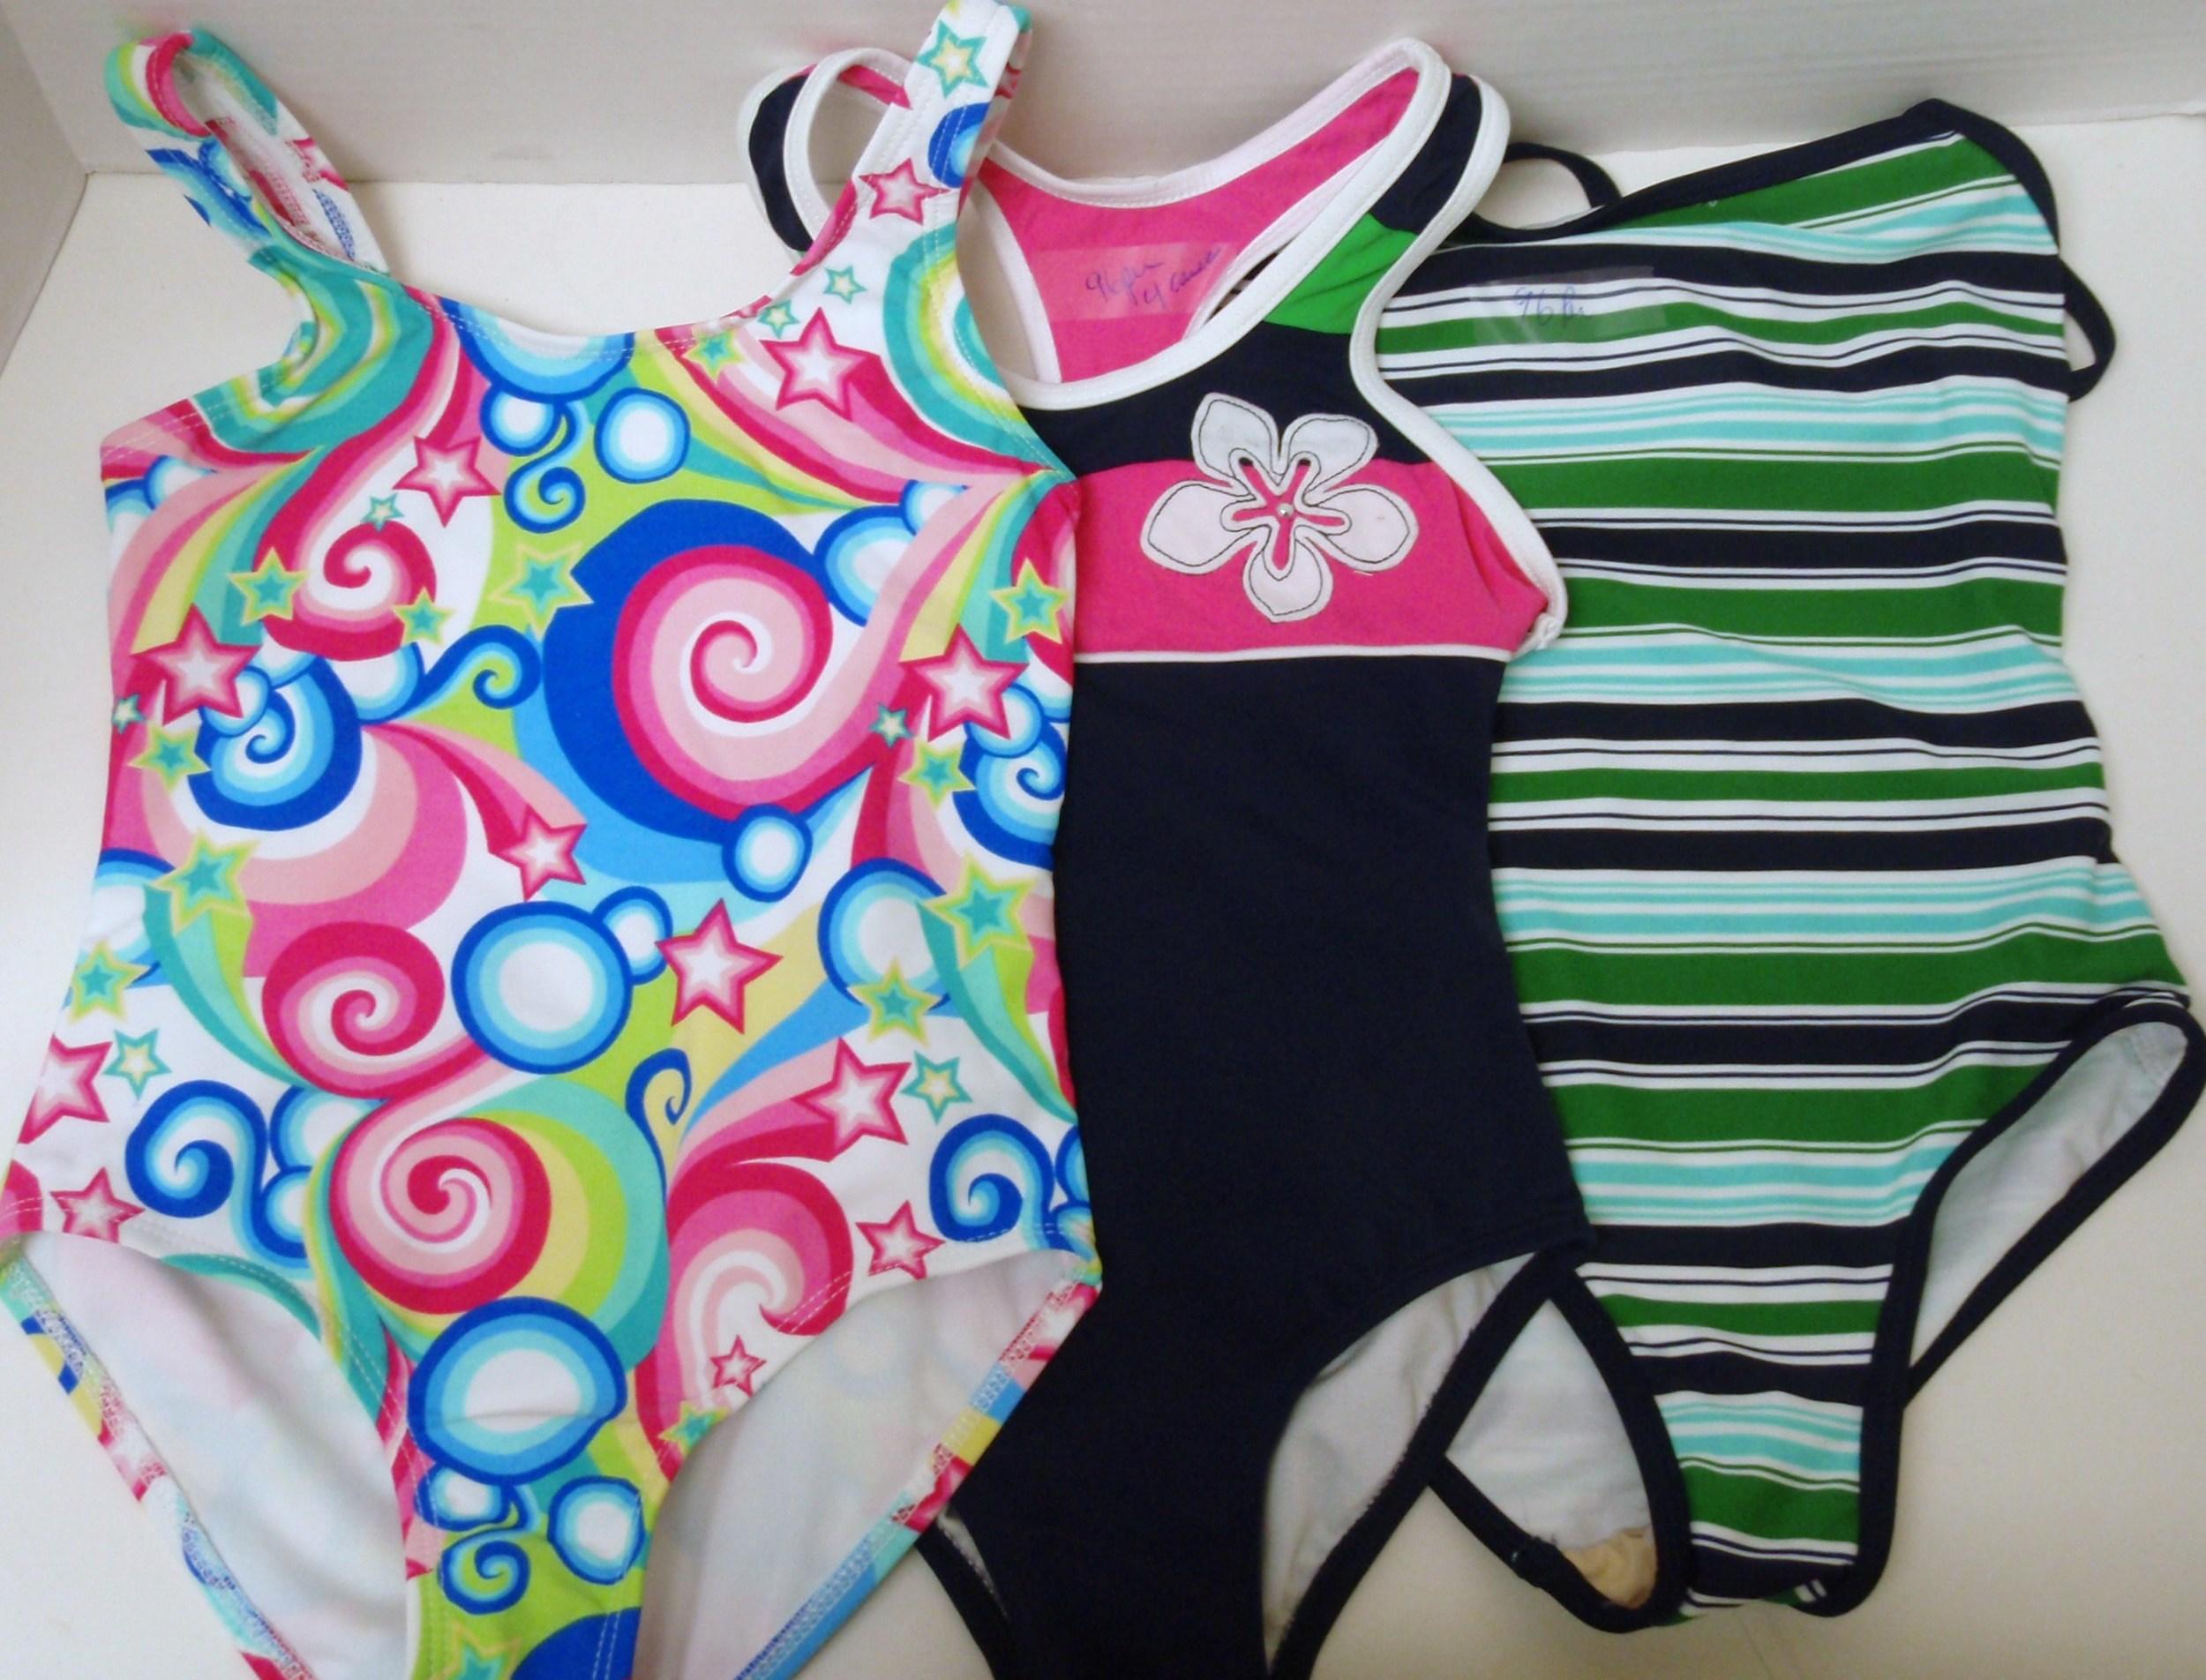 Girl's 1pc Assorted Stripe/Floral/Stars - 96 per case